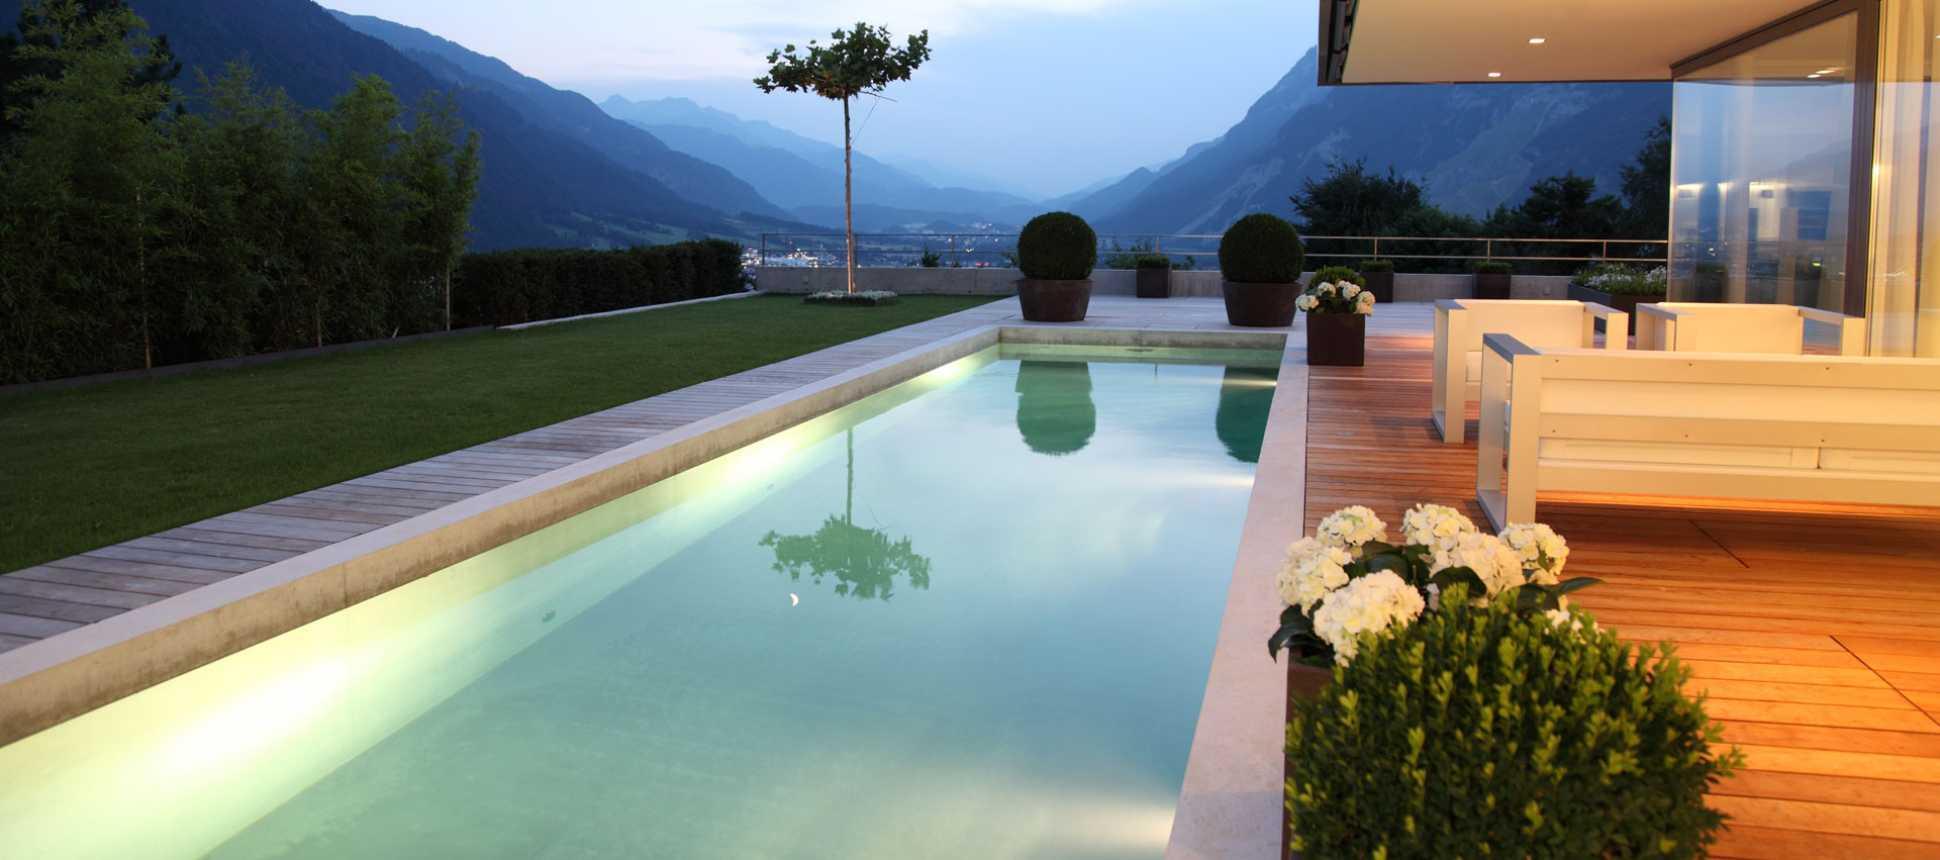 Betonpool Poolbau Schweiz